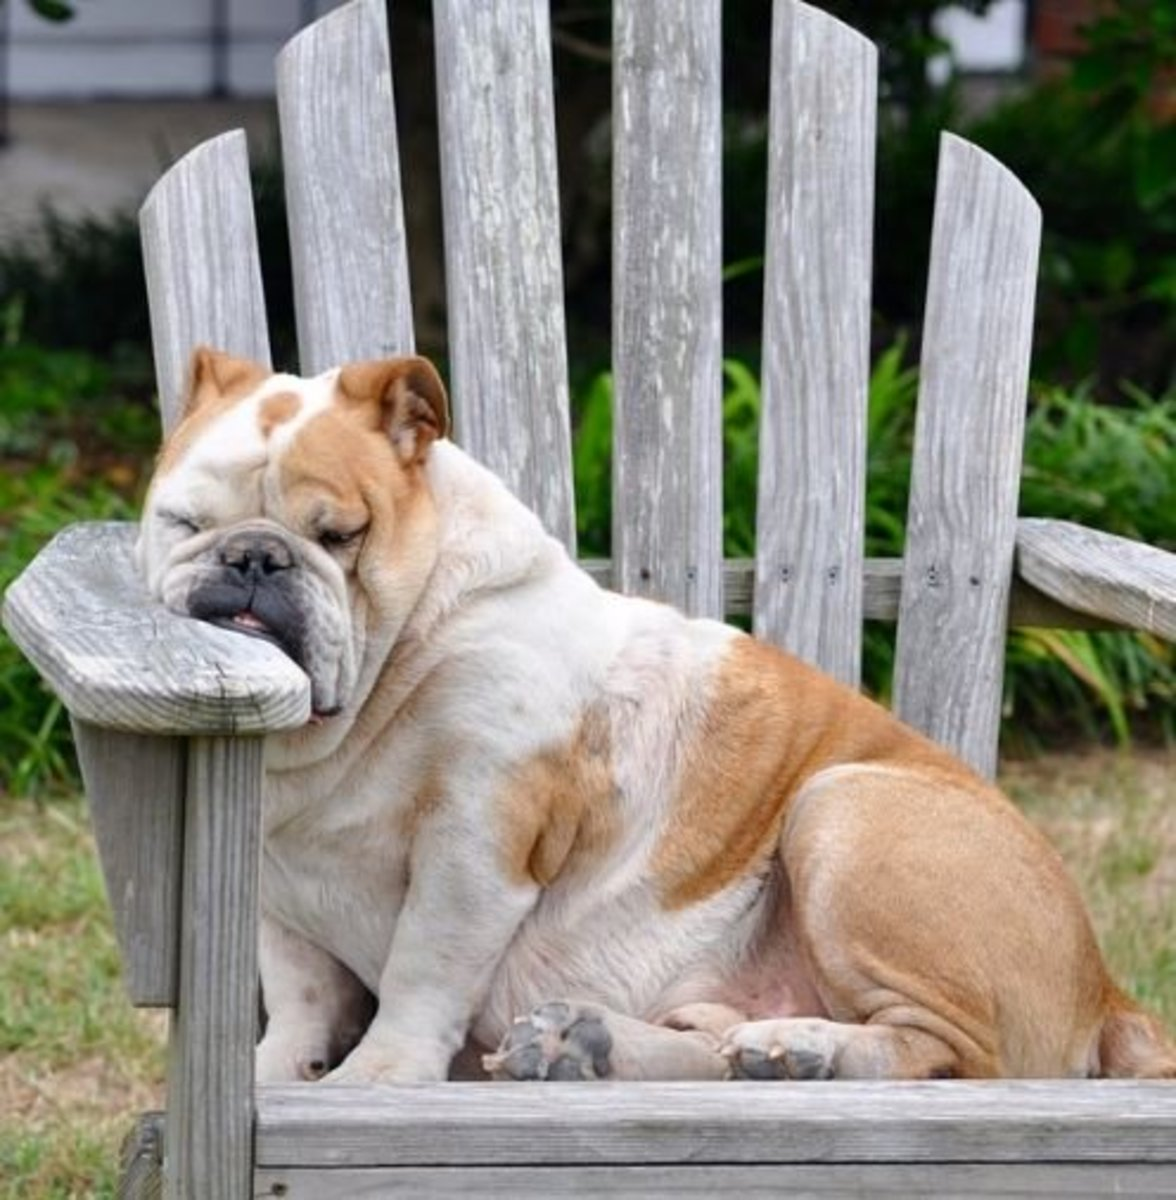 Some brachycephalic dog breeds are prone to snoring.